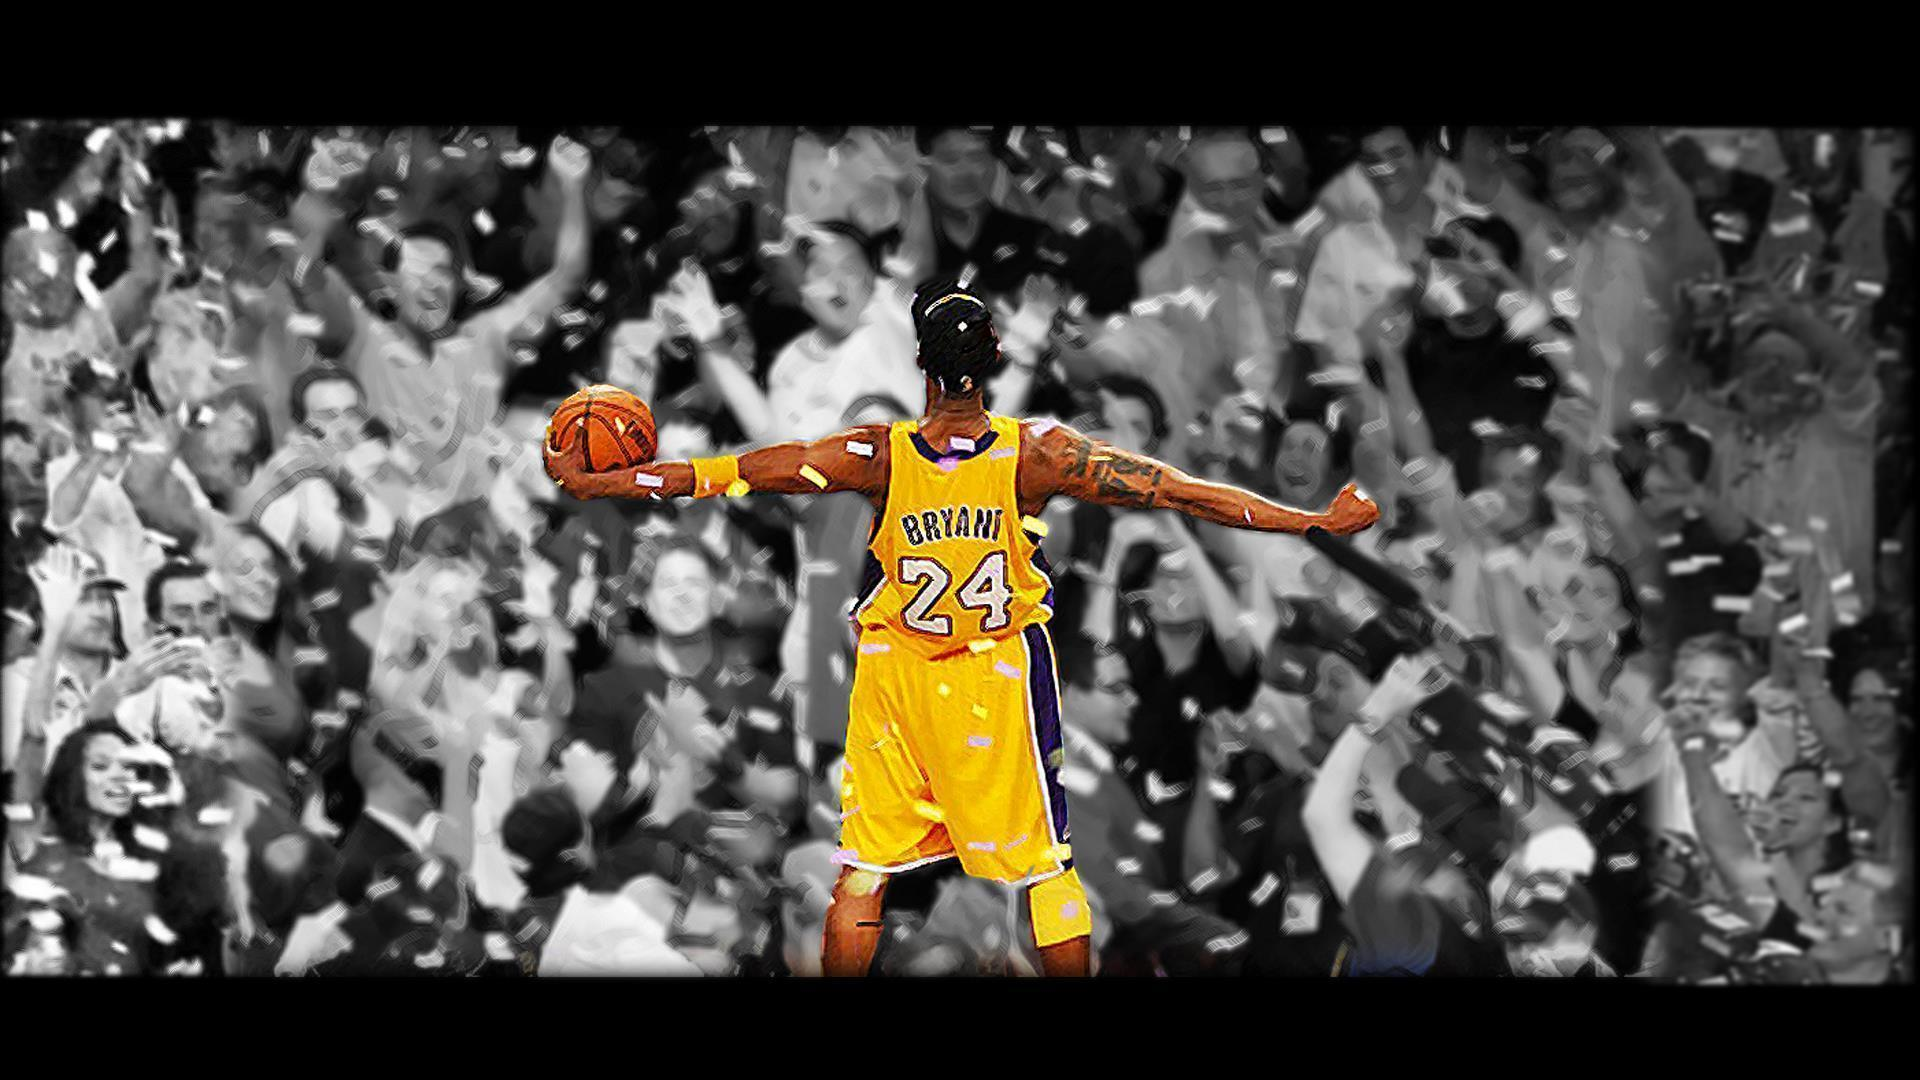 Nba Kobe Bryant Wallpaper: Kobe Bryant Wallpapers 2016